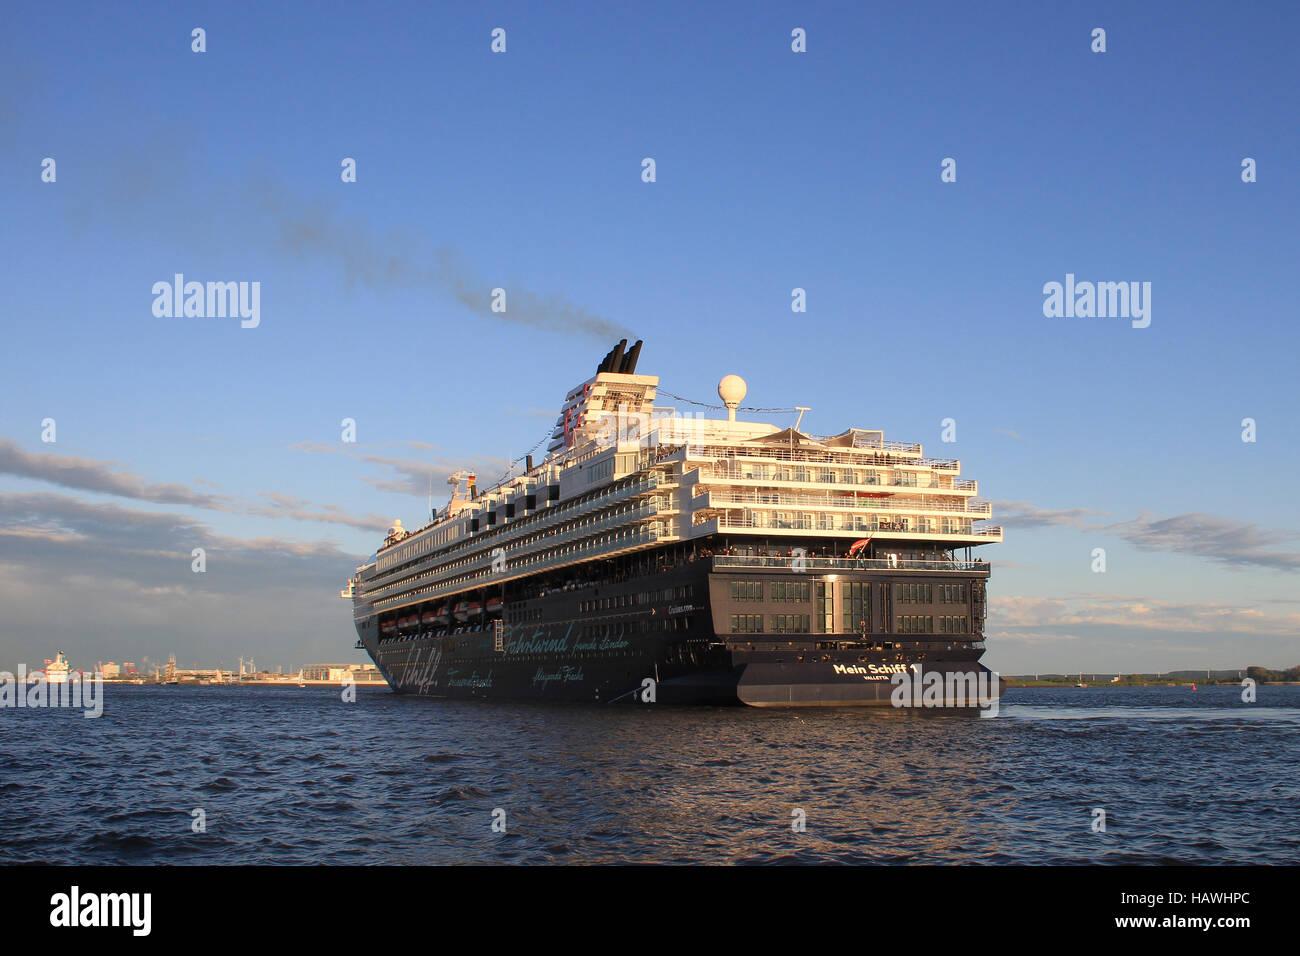 Cruise ship 'Mein Schiff 1' - Stock Image